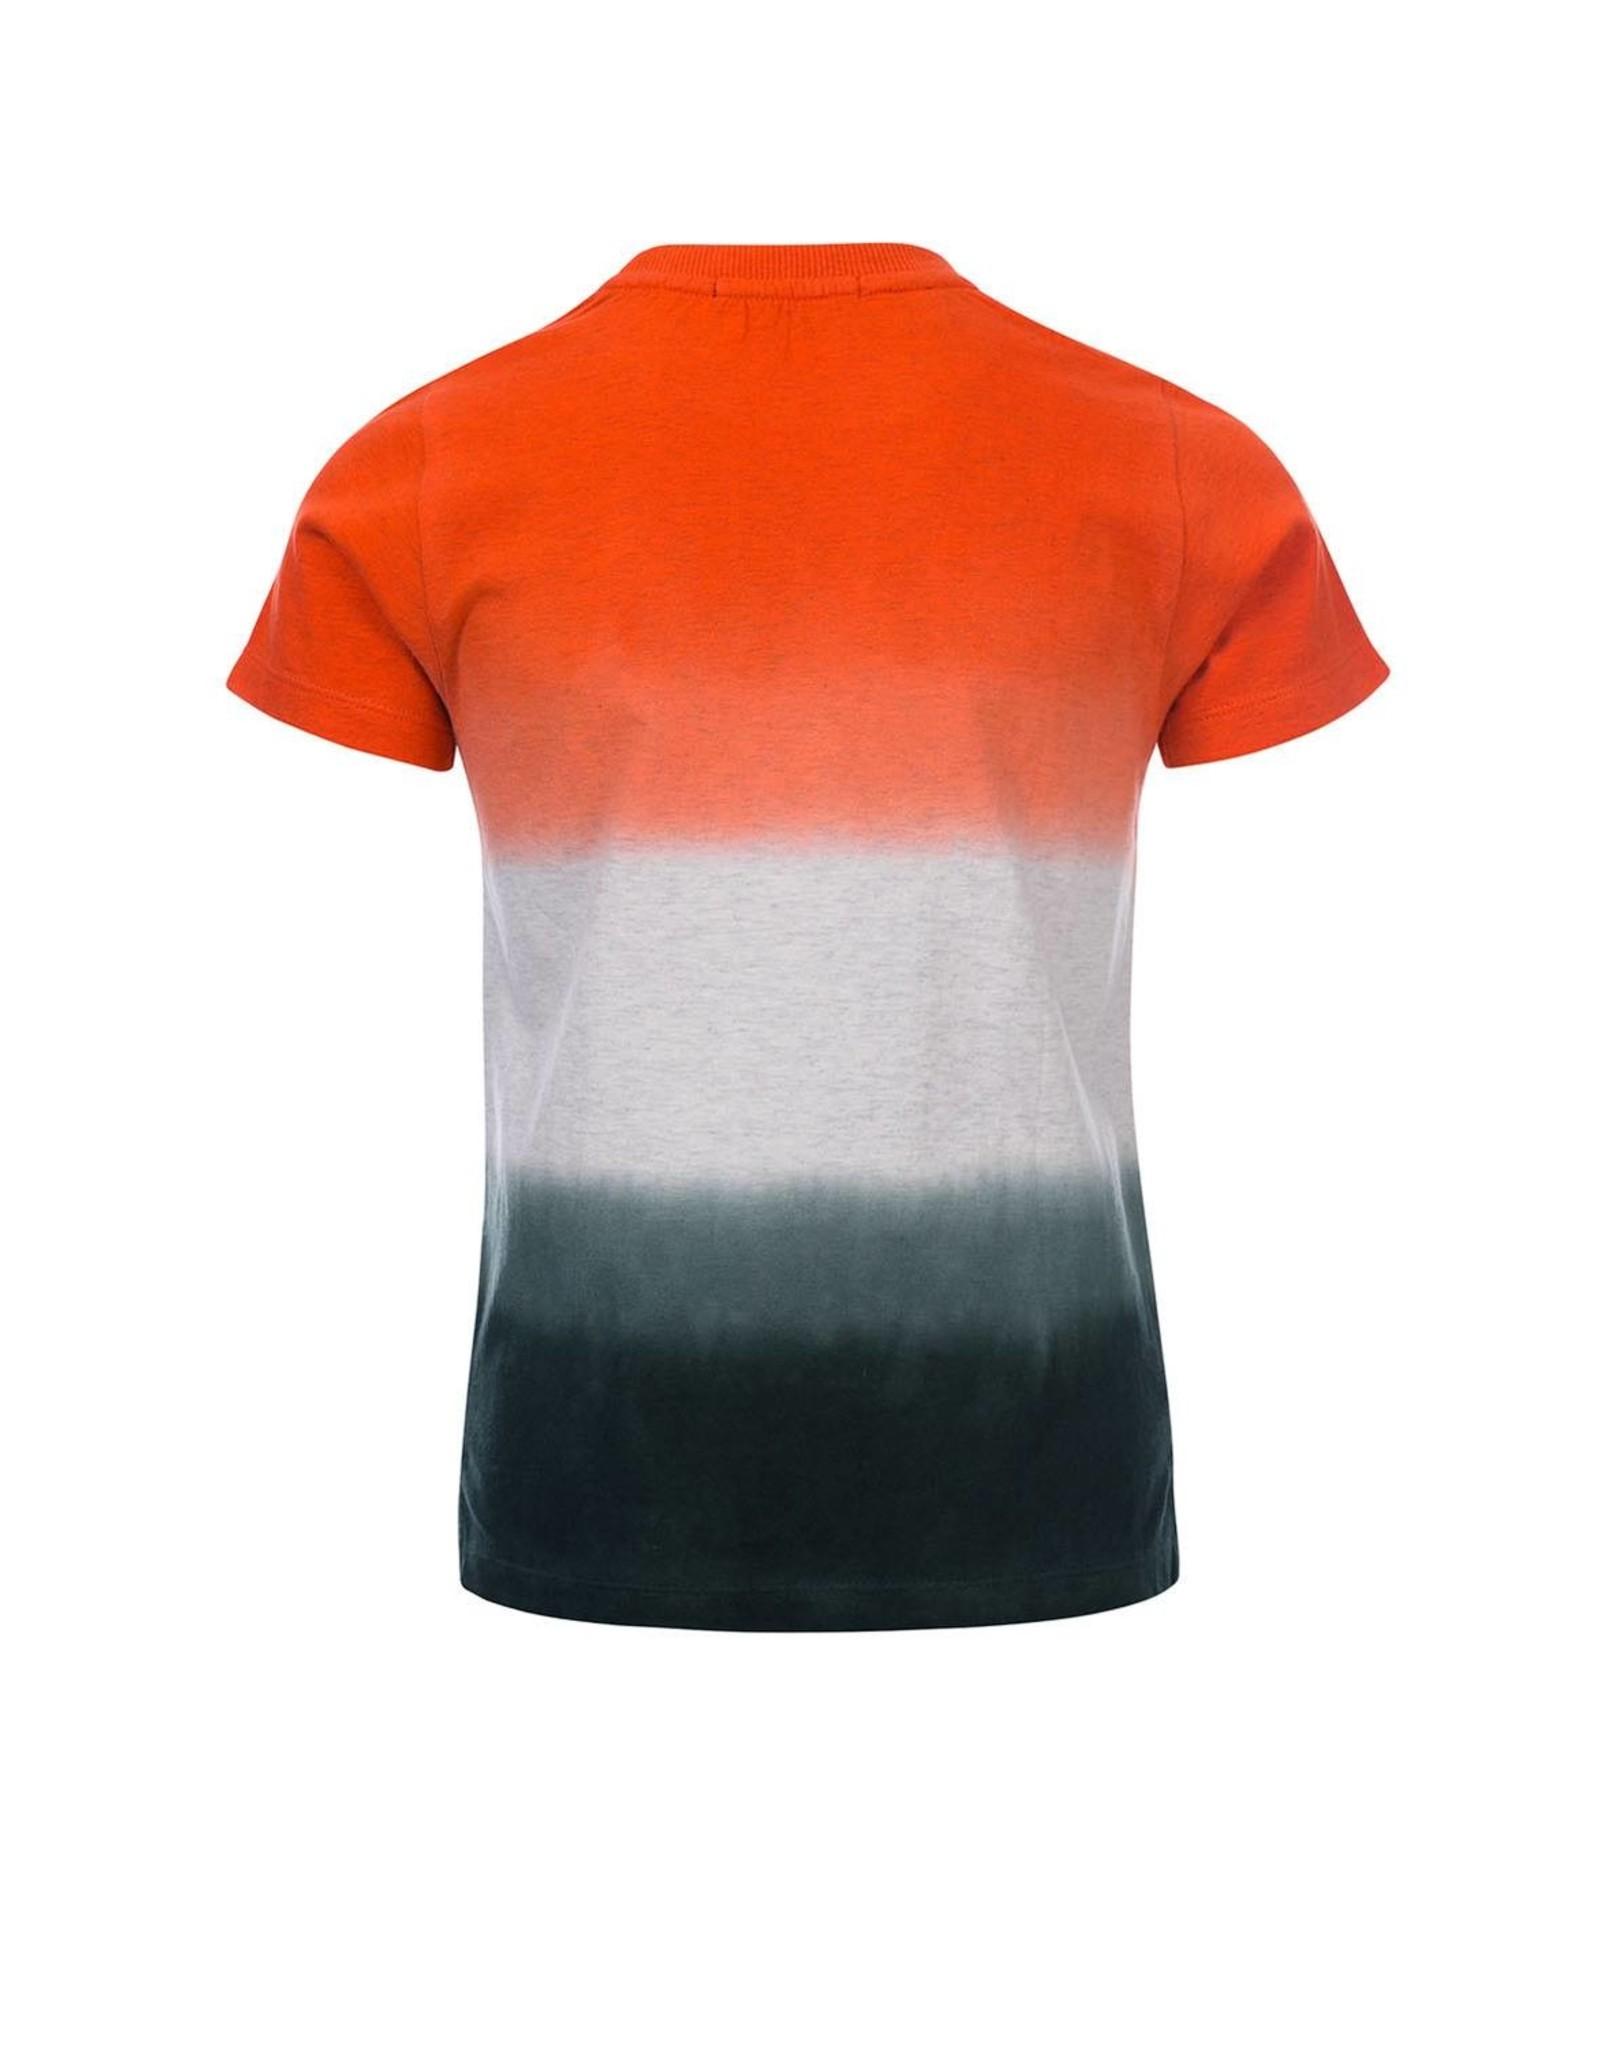 Common Heroes TIM Dip dye T-shirt ivory